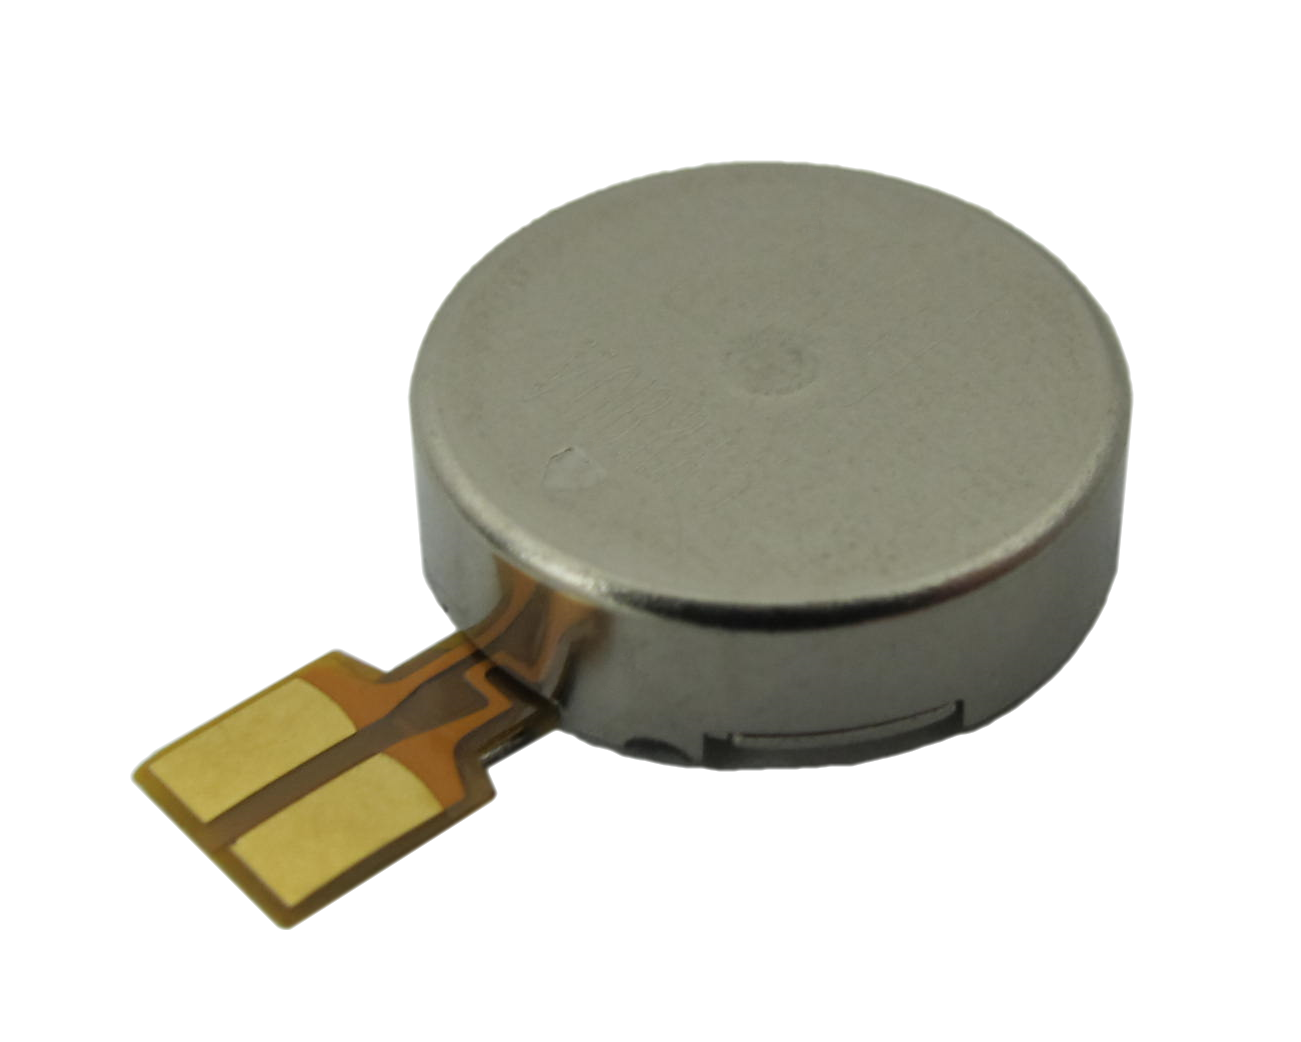 C1030B823L Coin Vibration Motor